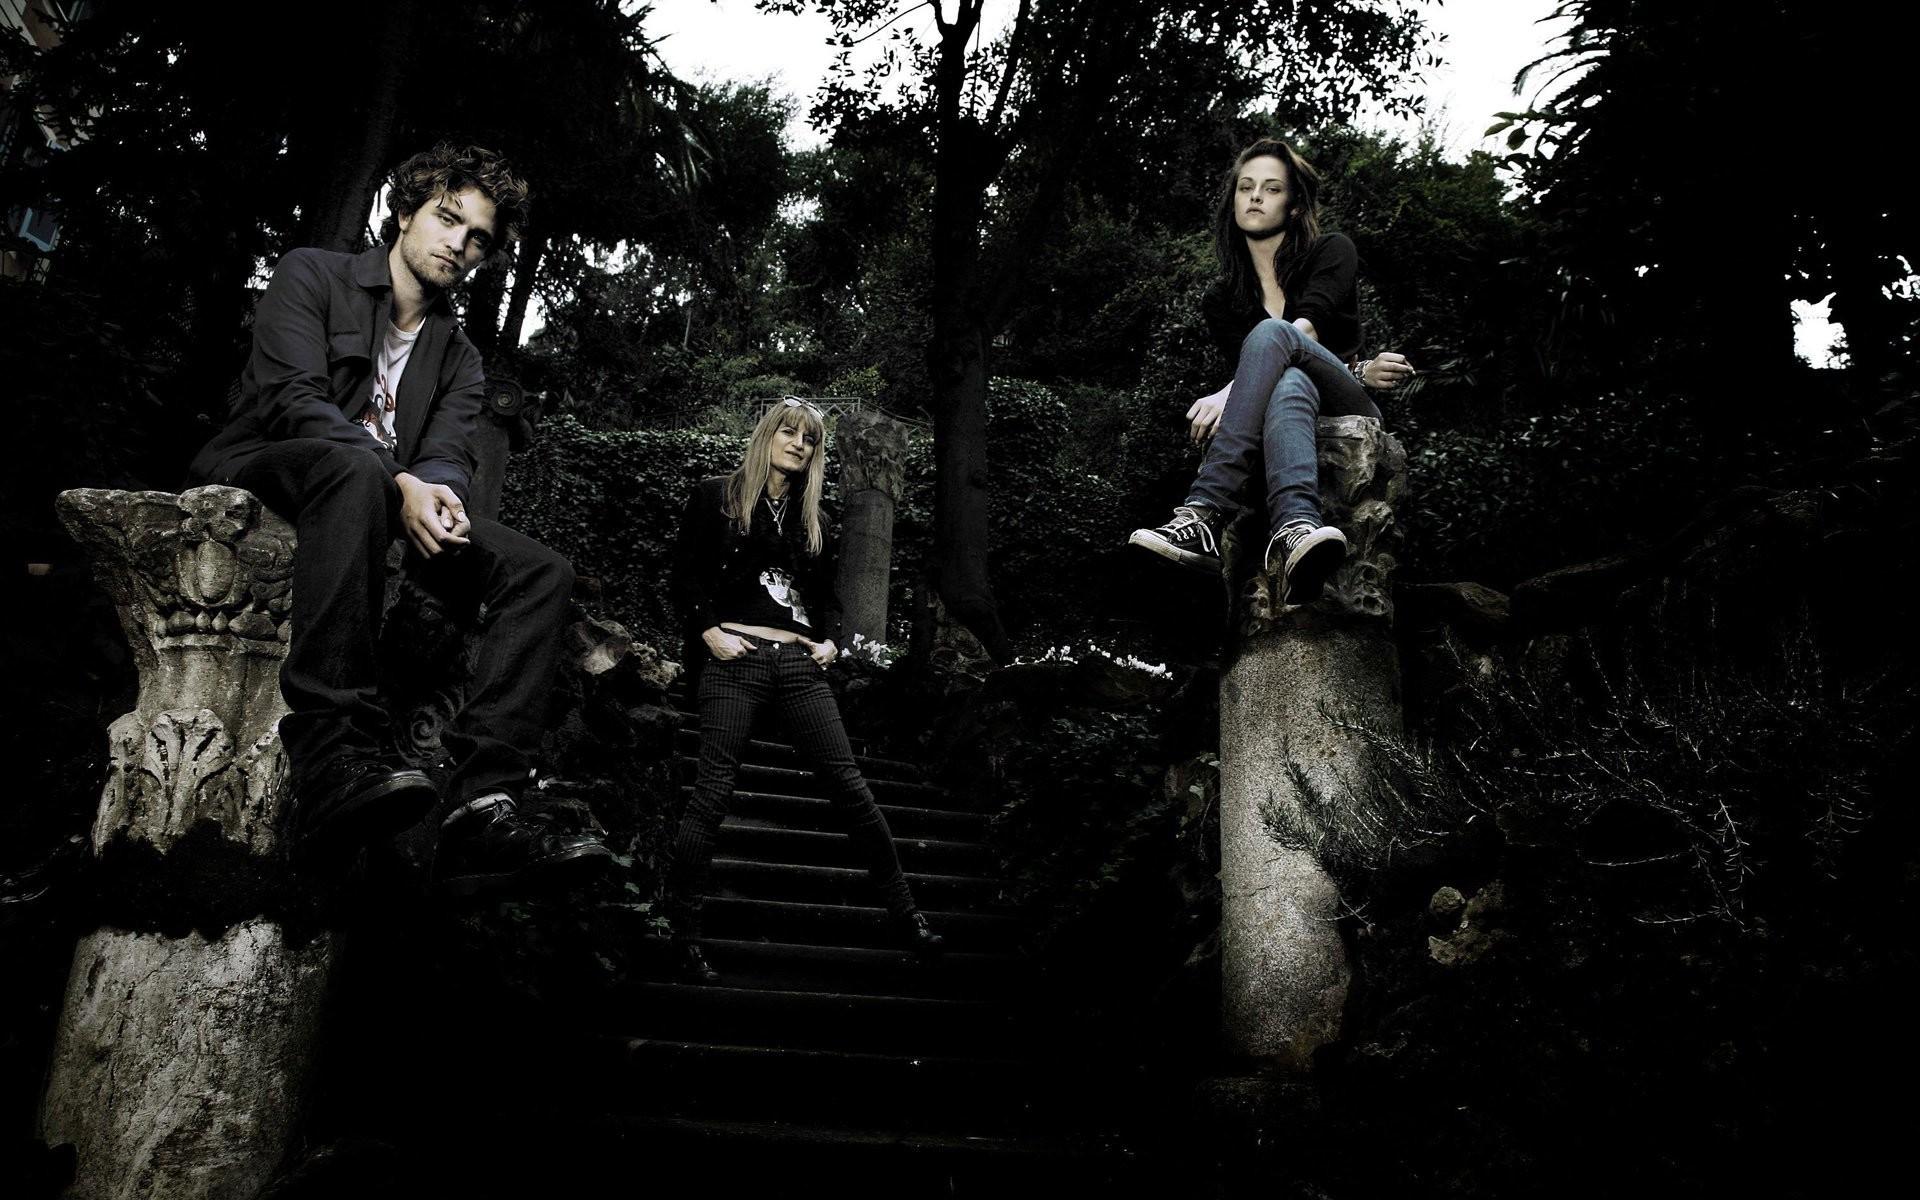 Twilight Breaking Dawn Part 2 Wallpaper Hd Edward Cullen Backgrounds 60 Images